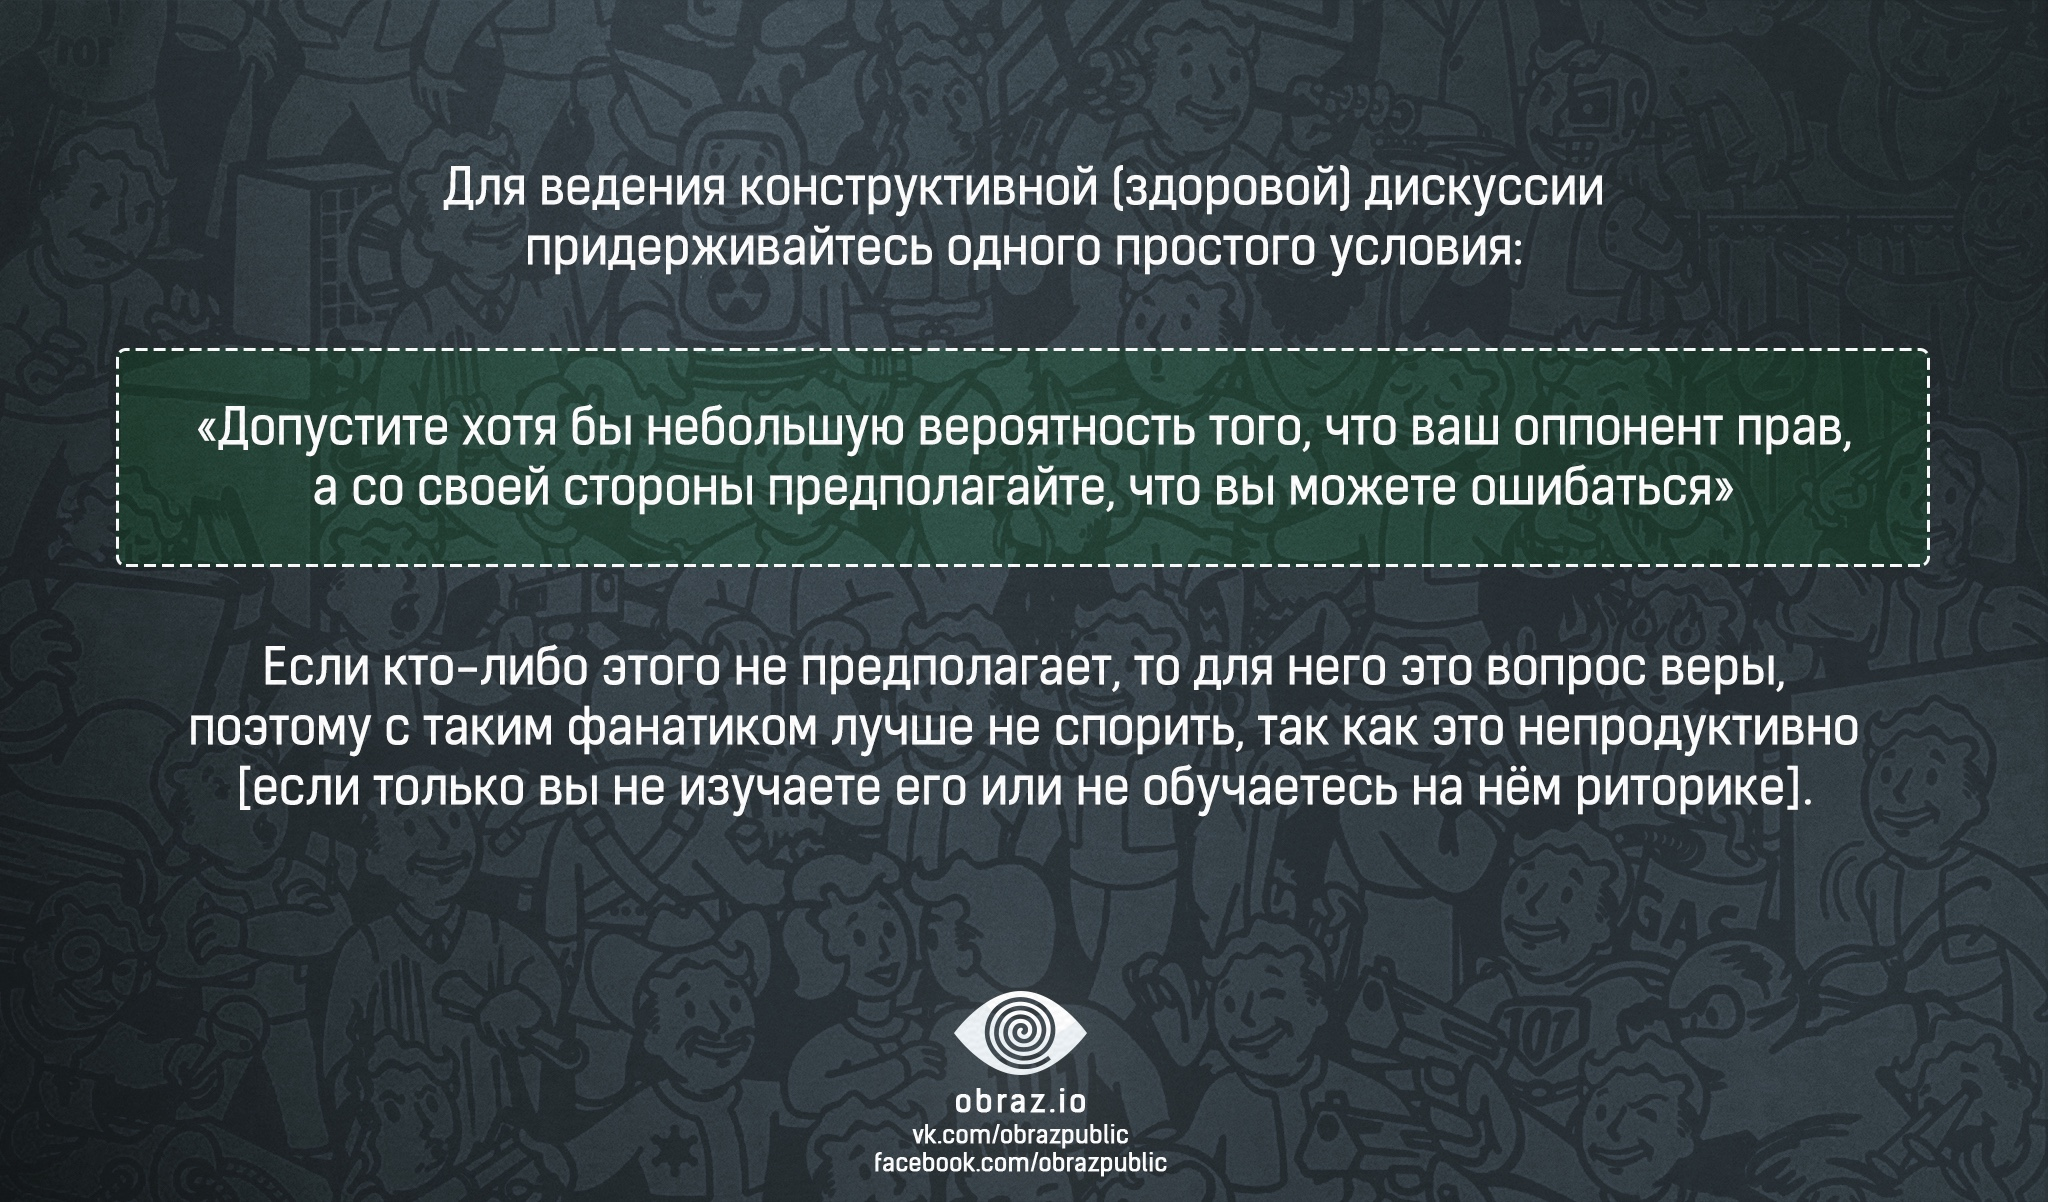 Email:learningkurakov@gmail com3292 1faq8qr.y613kjfw29